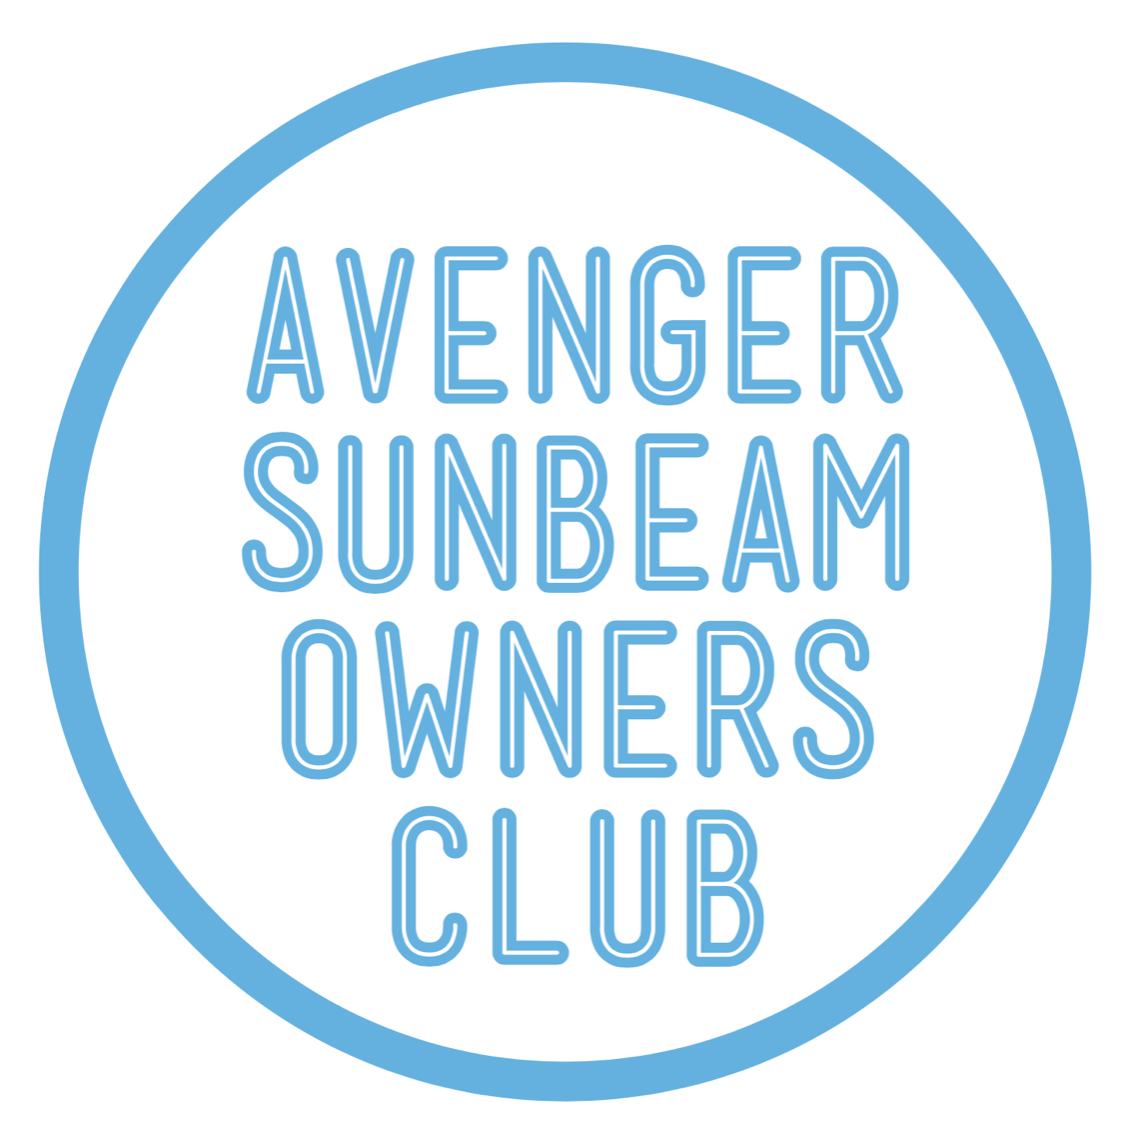 Avenger Sunbeam Owners Club